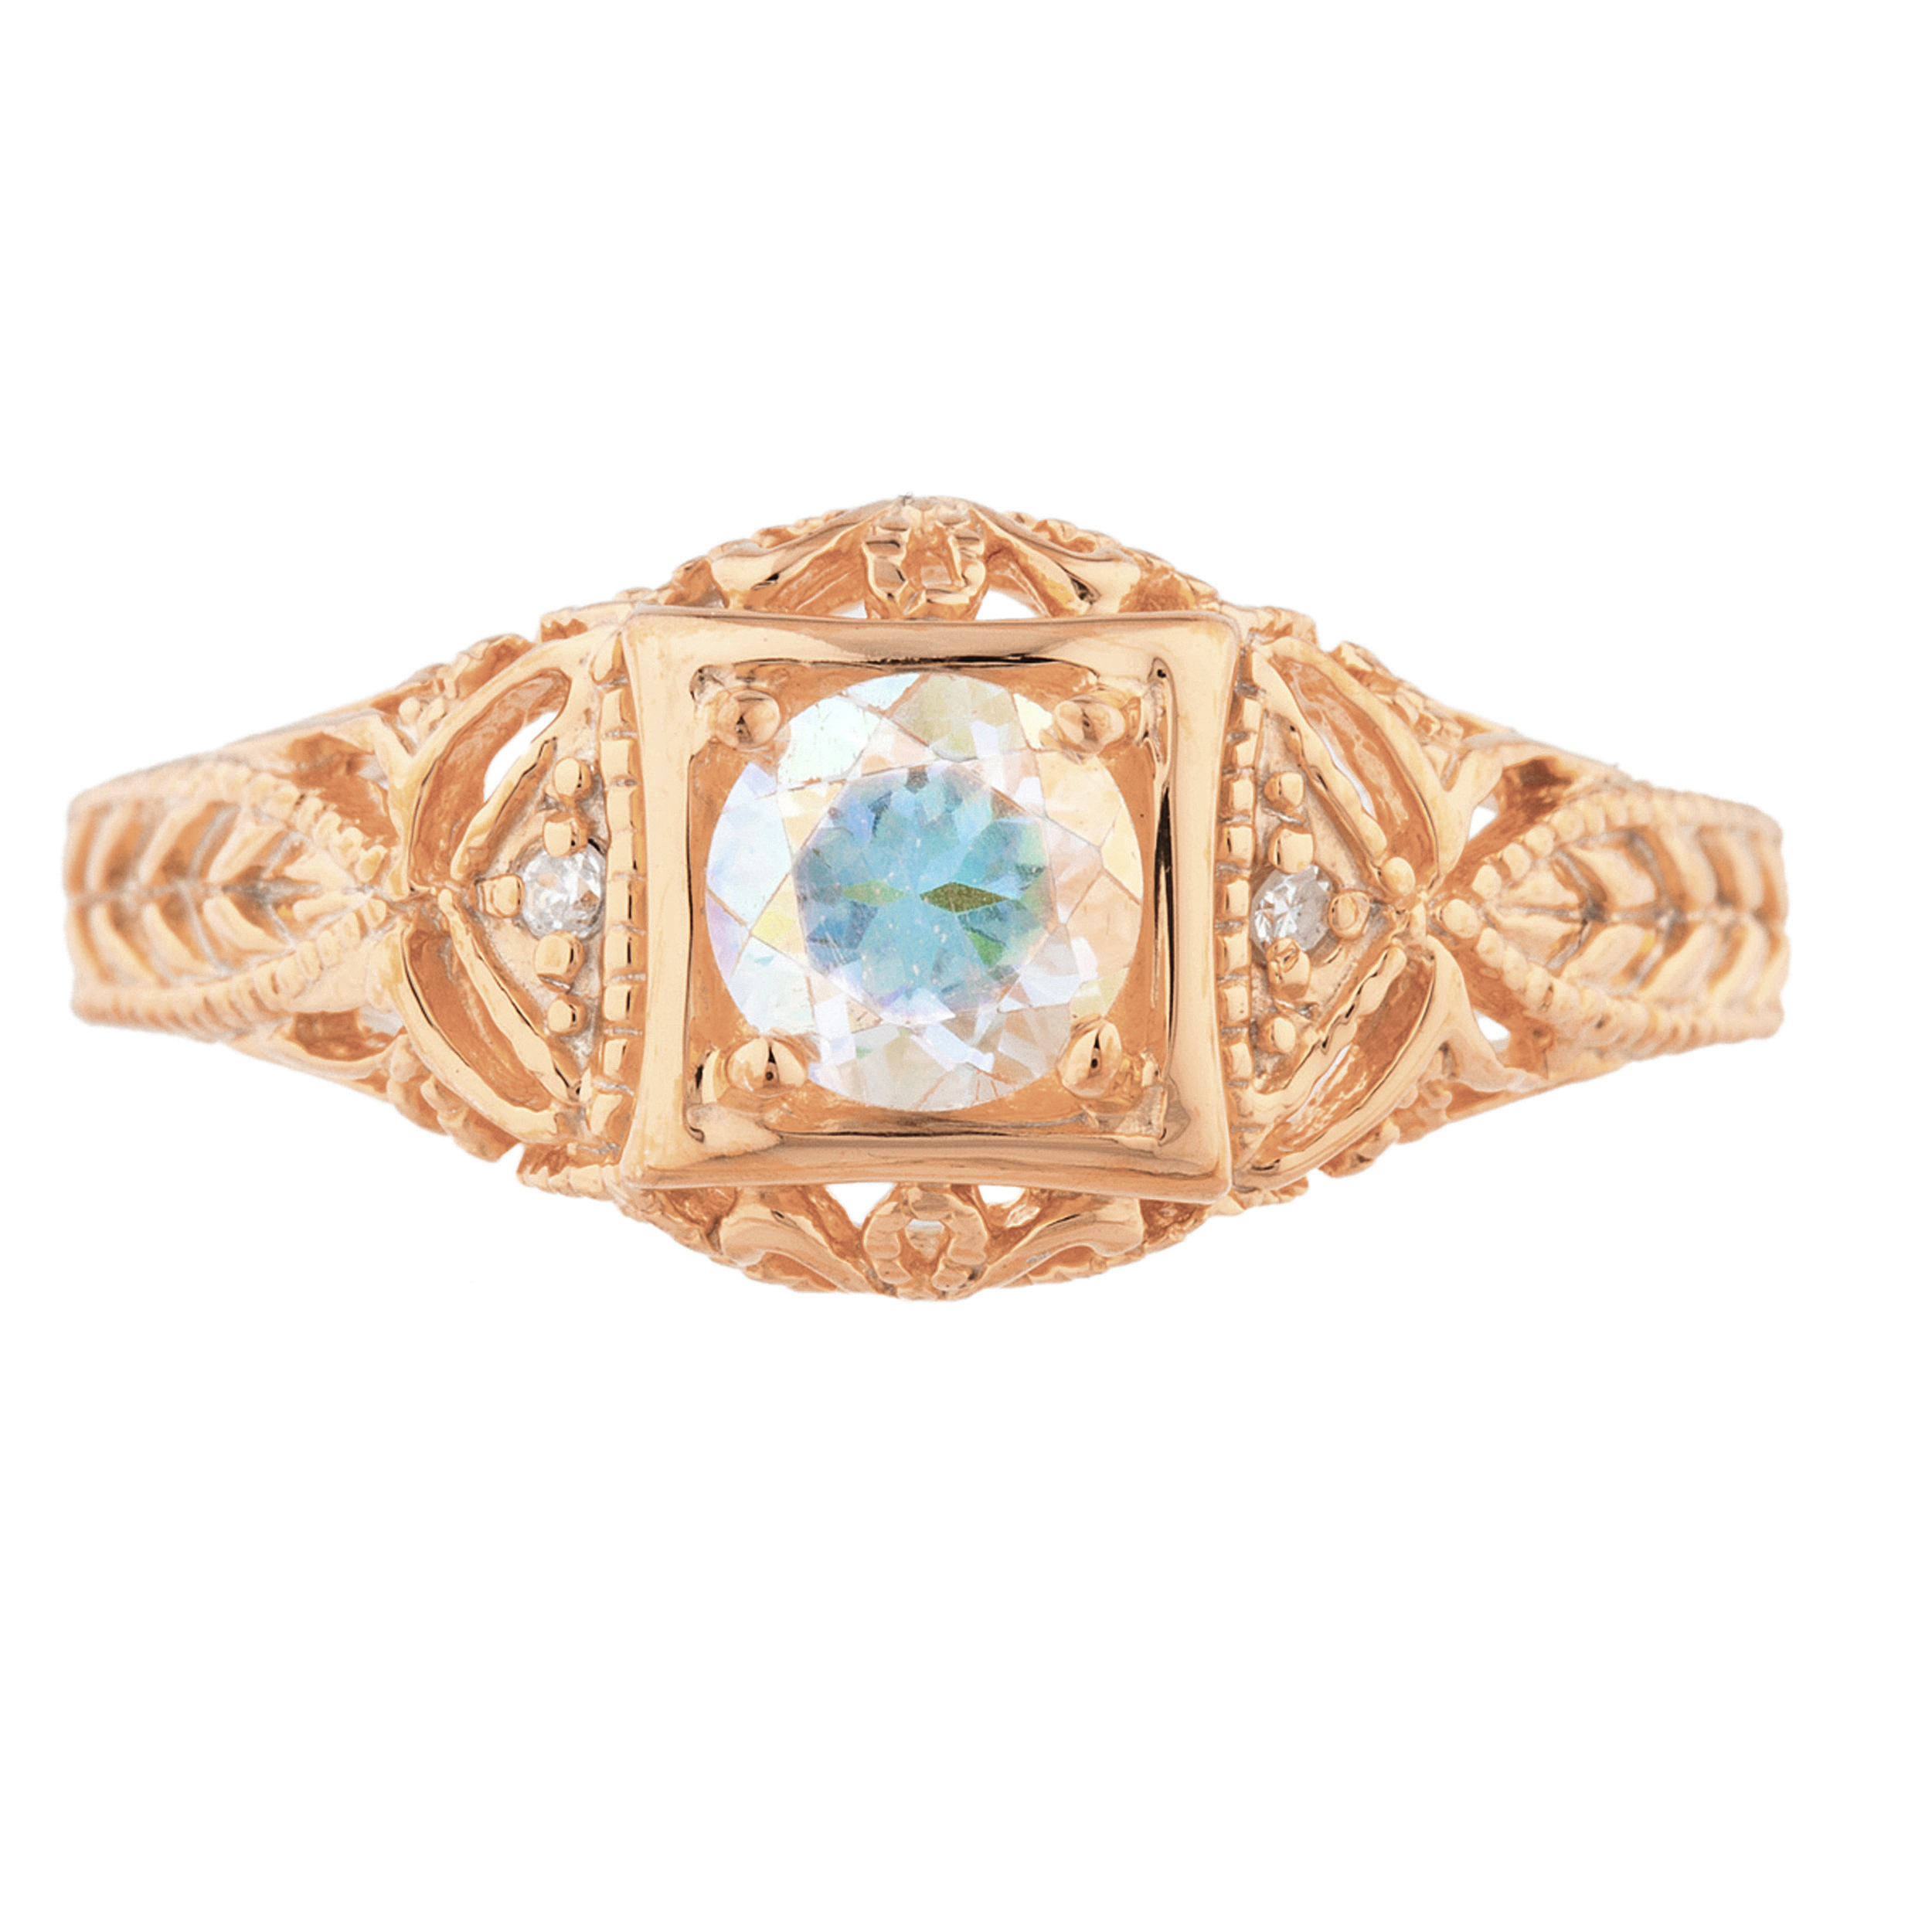 0.50 Ct Natural Mercury Mist Mystic Topaz /& Diamond Round Ring 14Kt Yellow Gold Rose Gold Silver